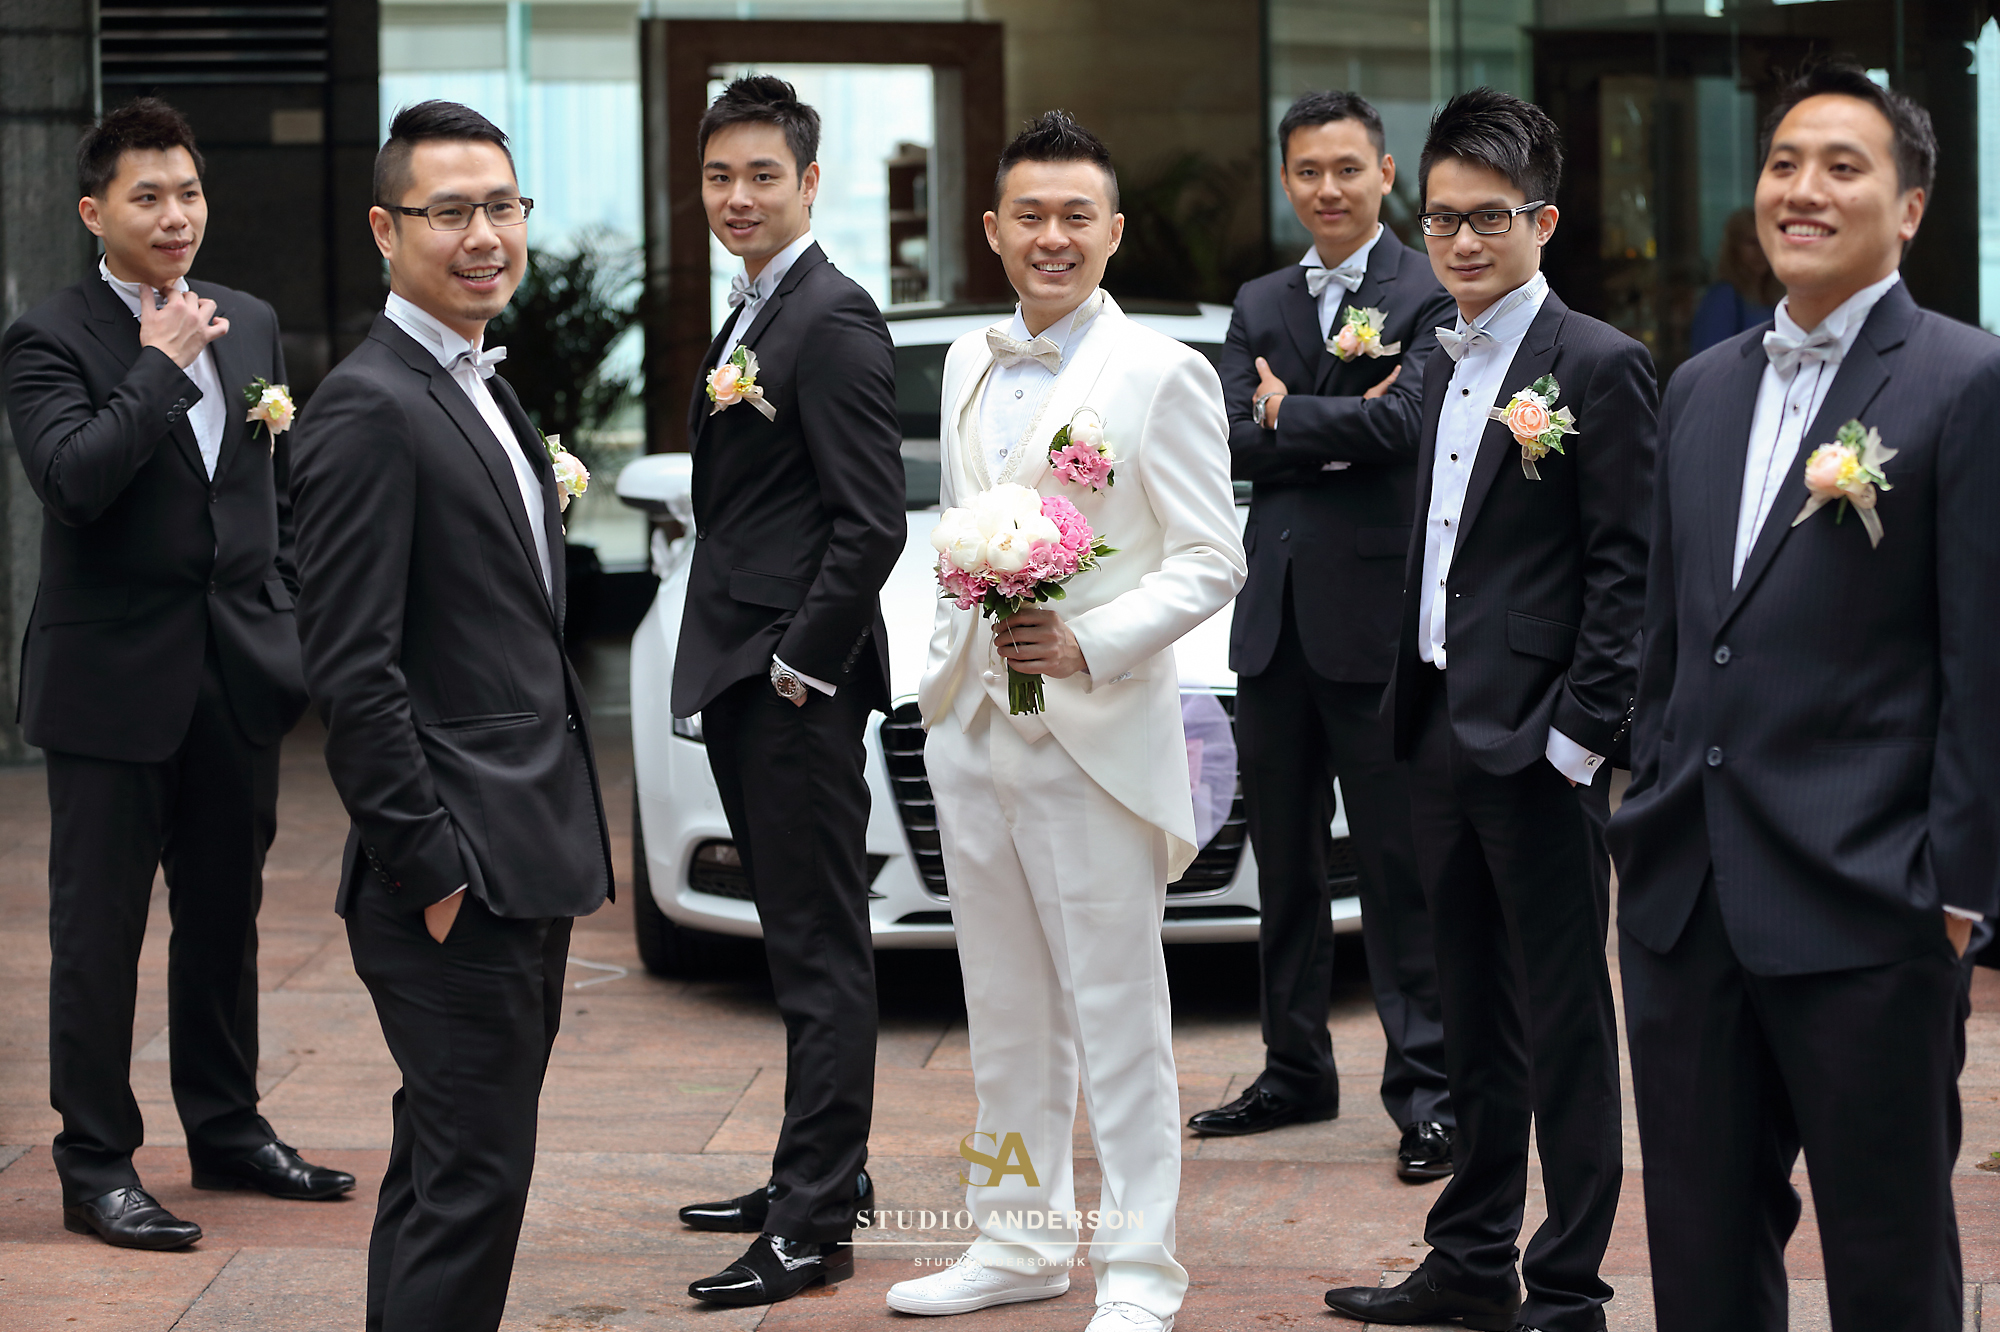 11 JA wedding (Watermark).jpg